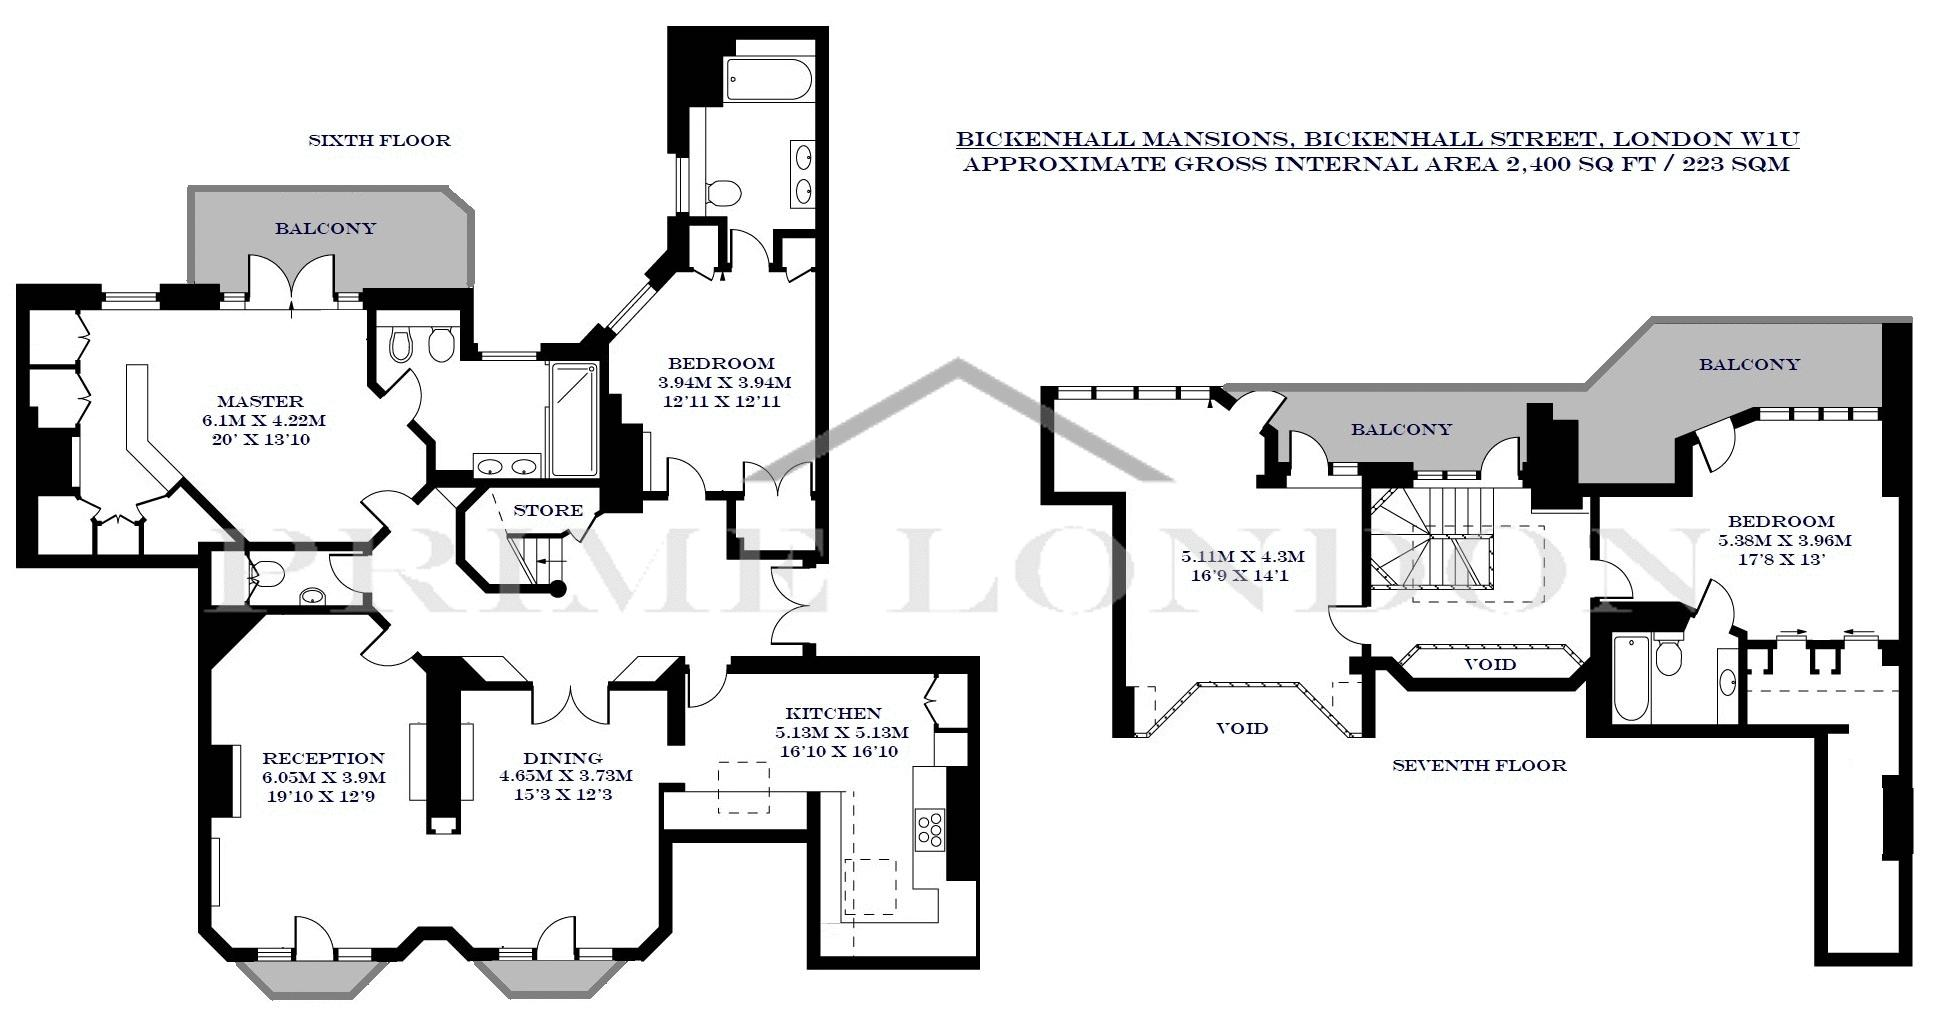 Bickenhall Mansions Bickenhall Street